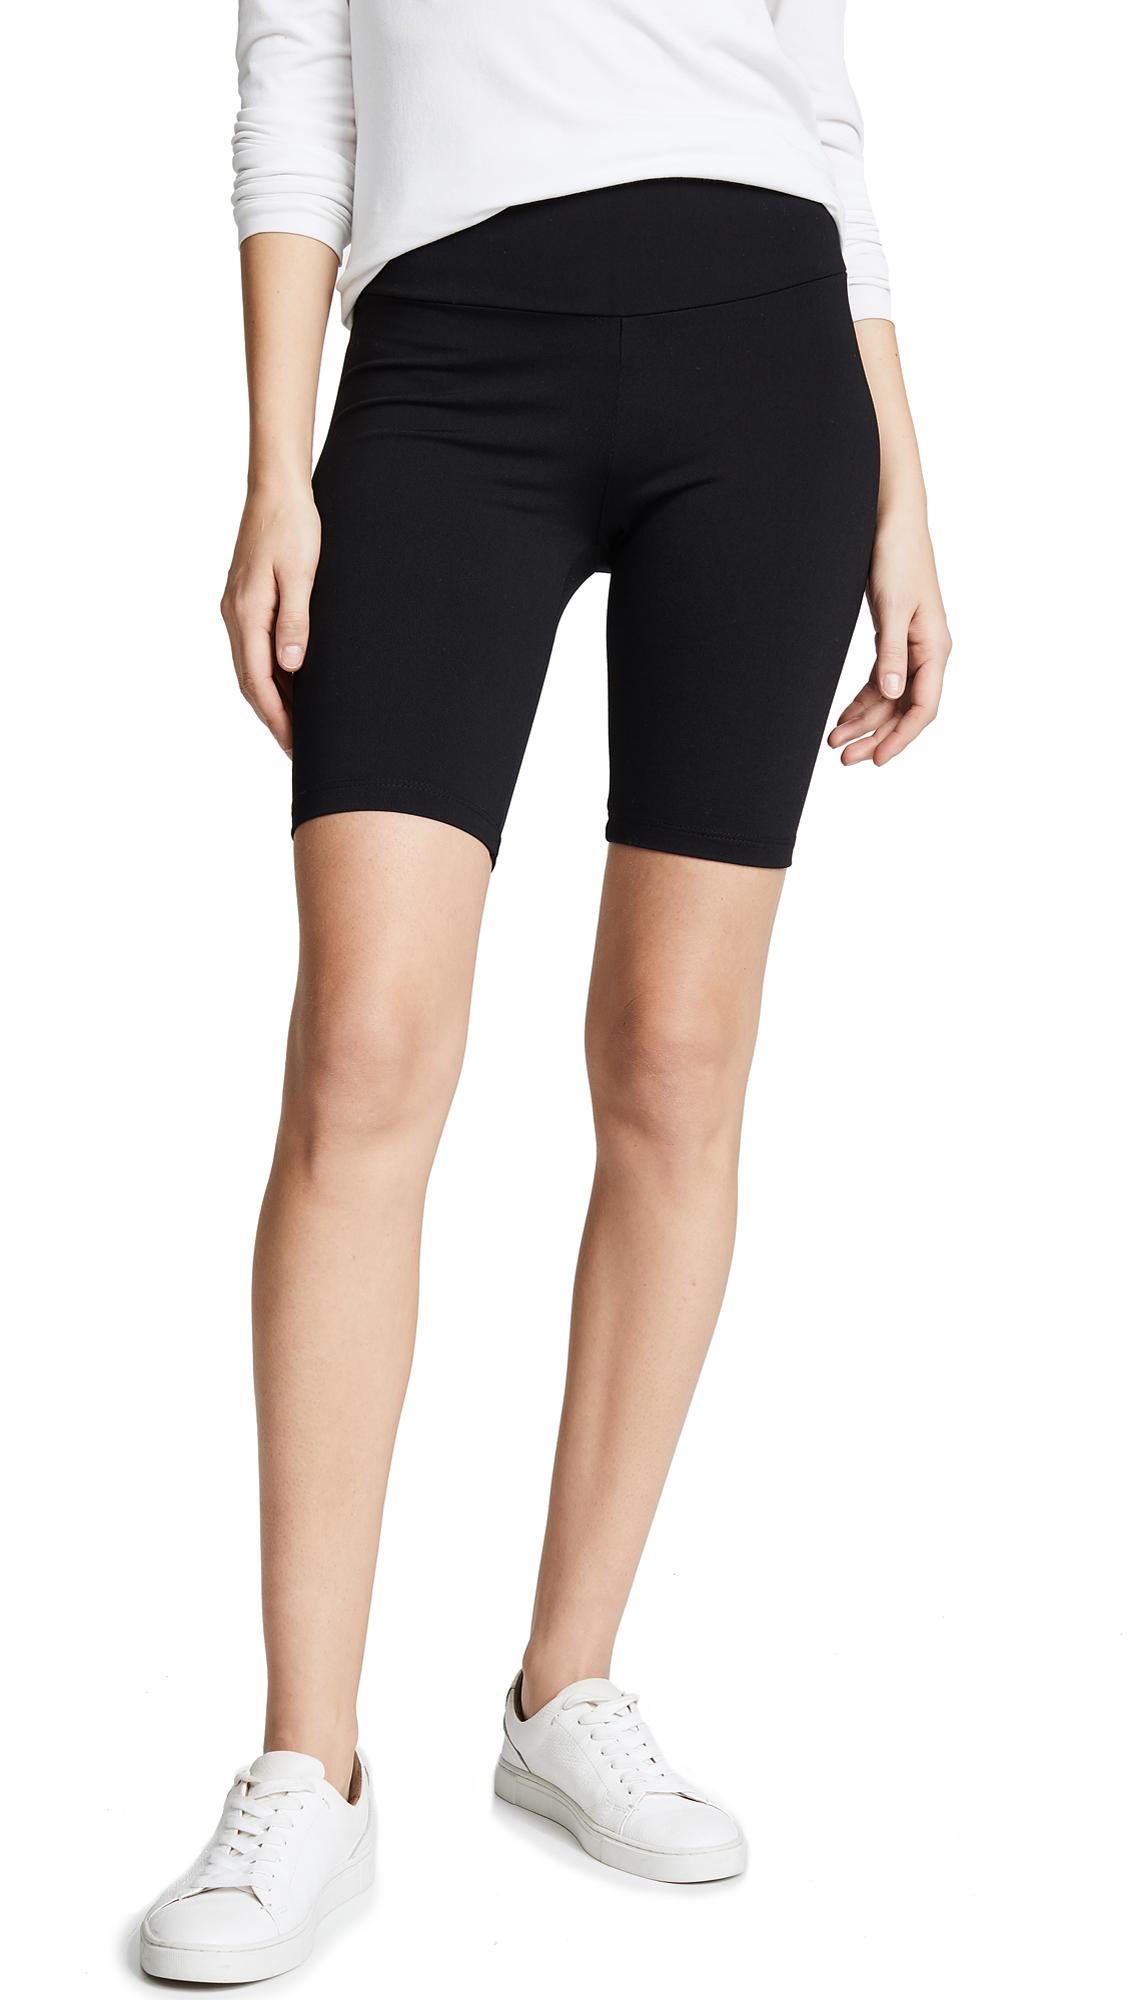 SUSANA MONACO Mid Length Bike Shorts in Black